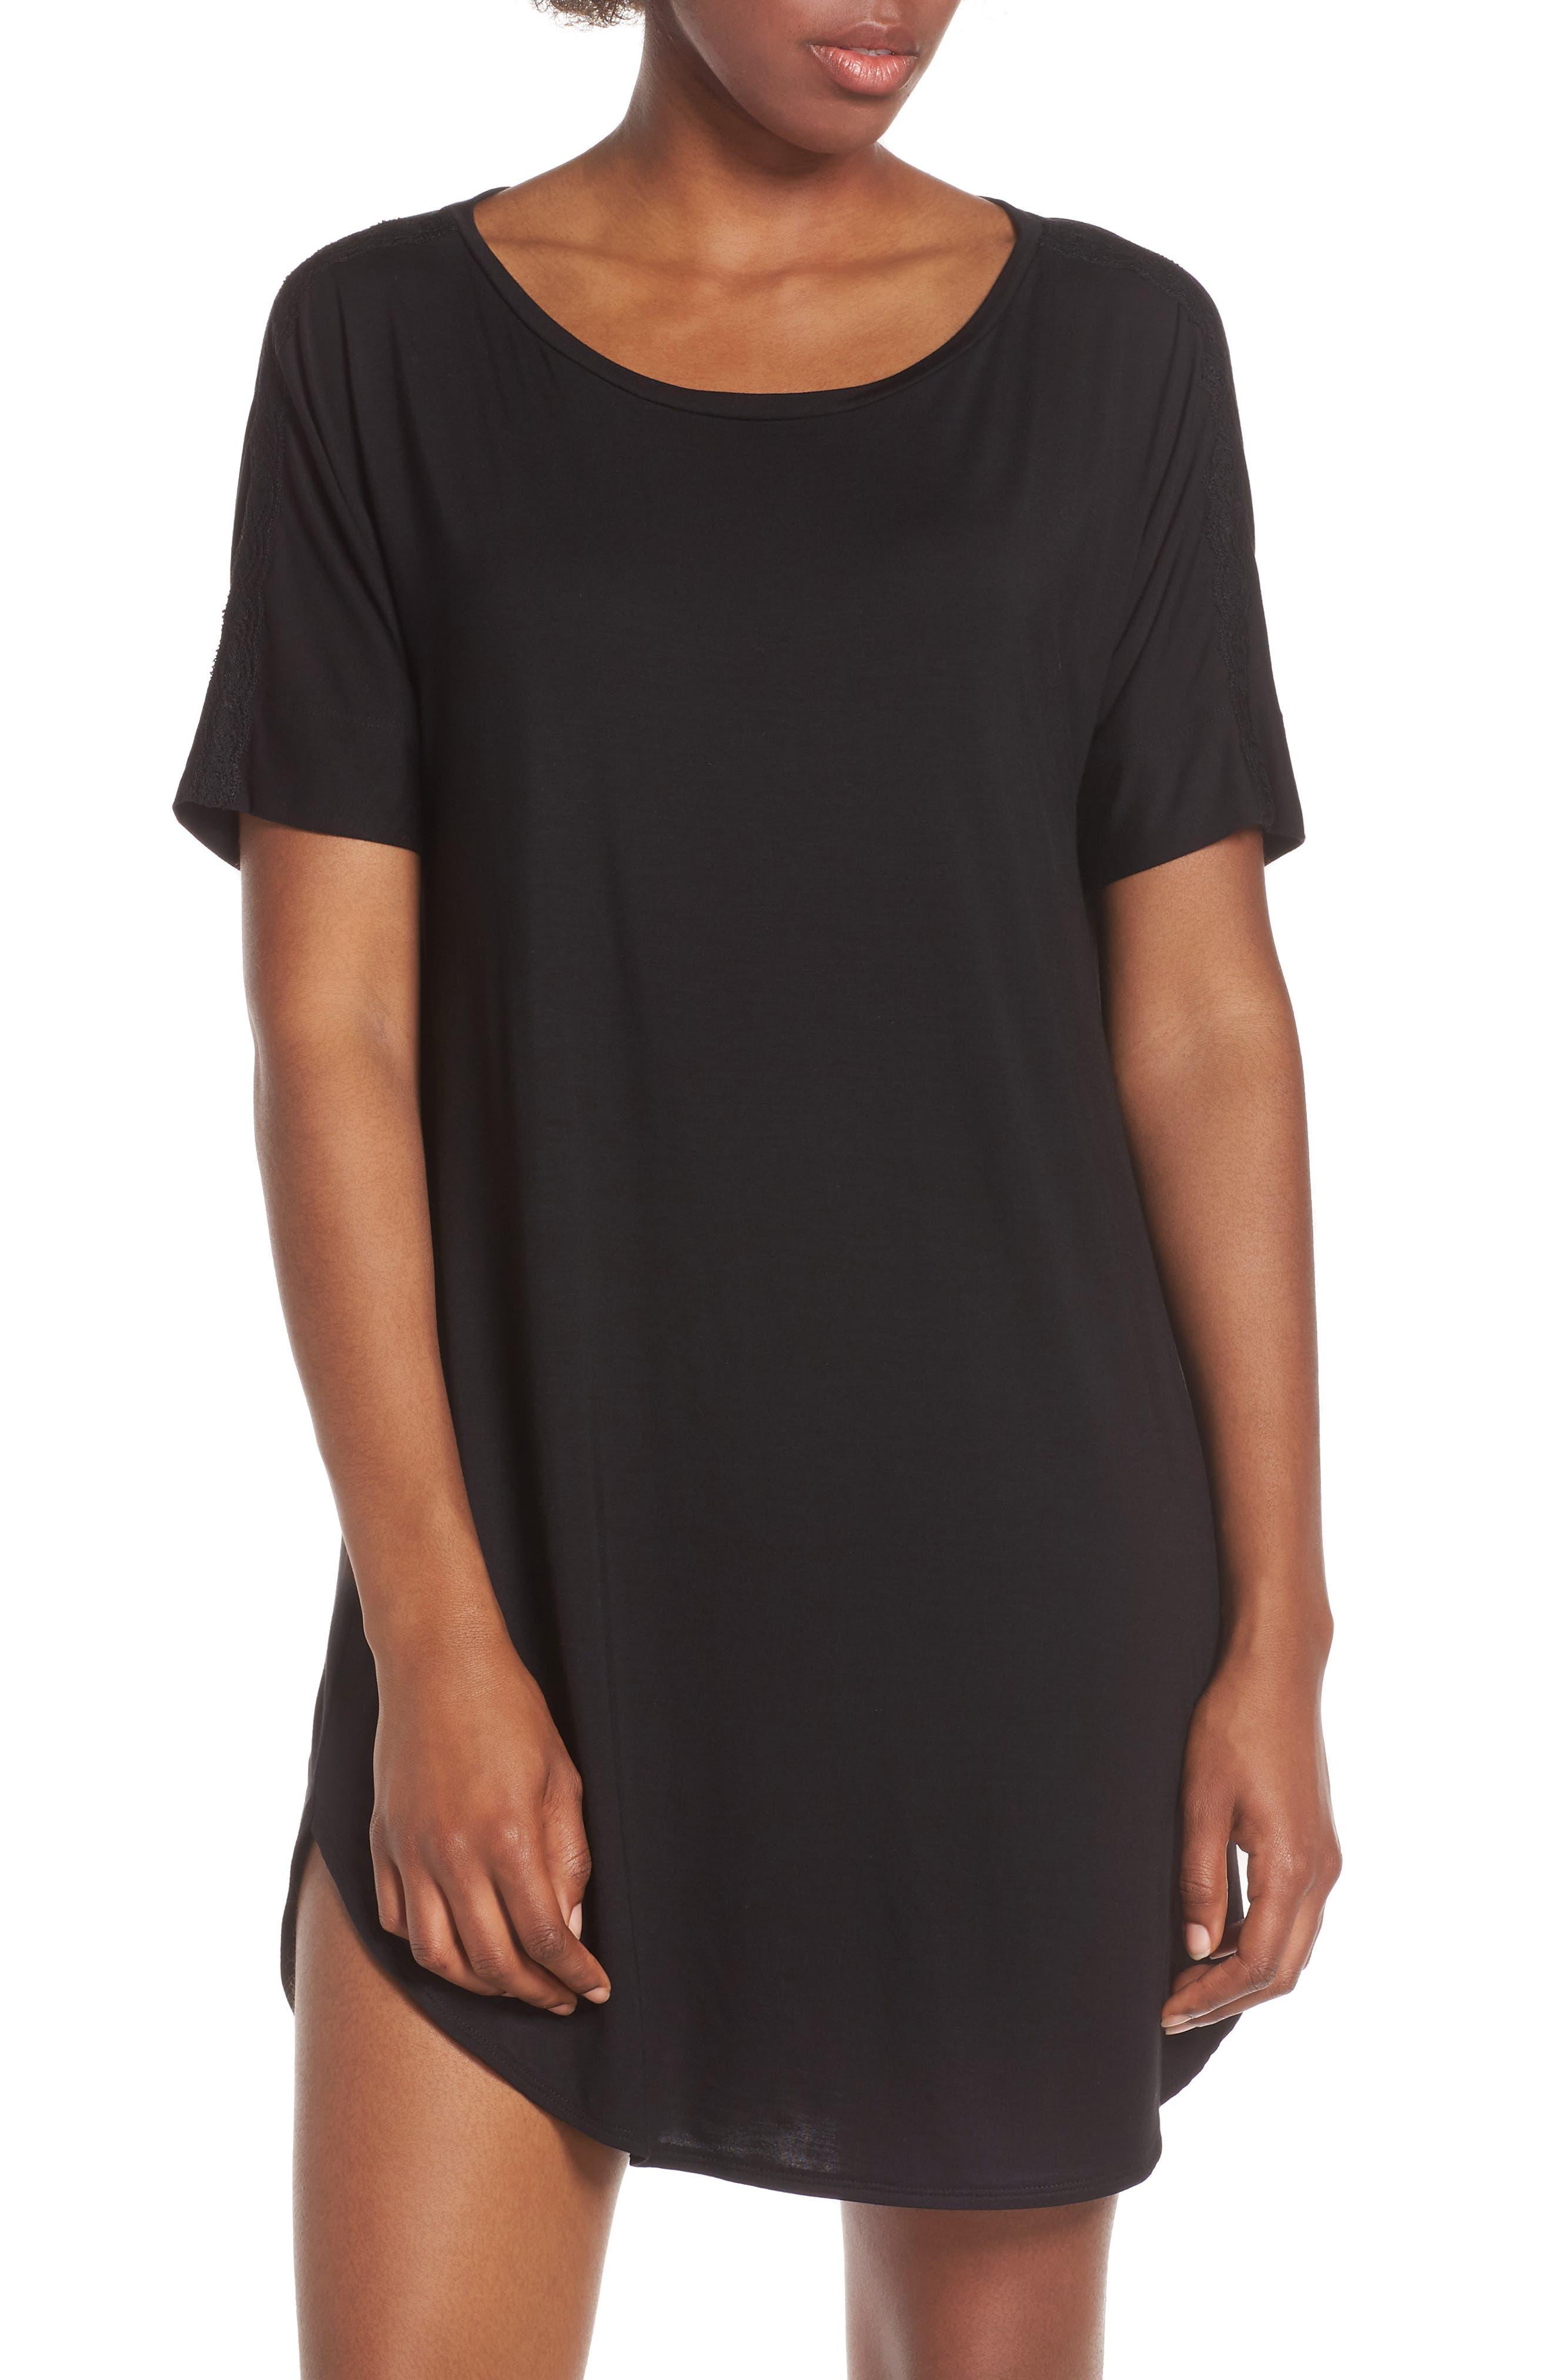 Natori Feathers Essential Sleep Shirt, Black